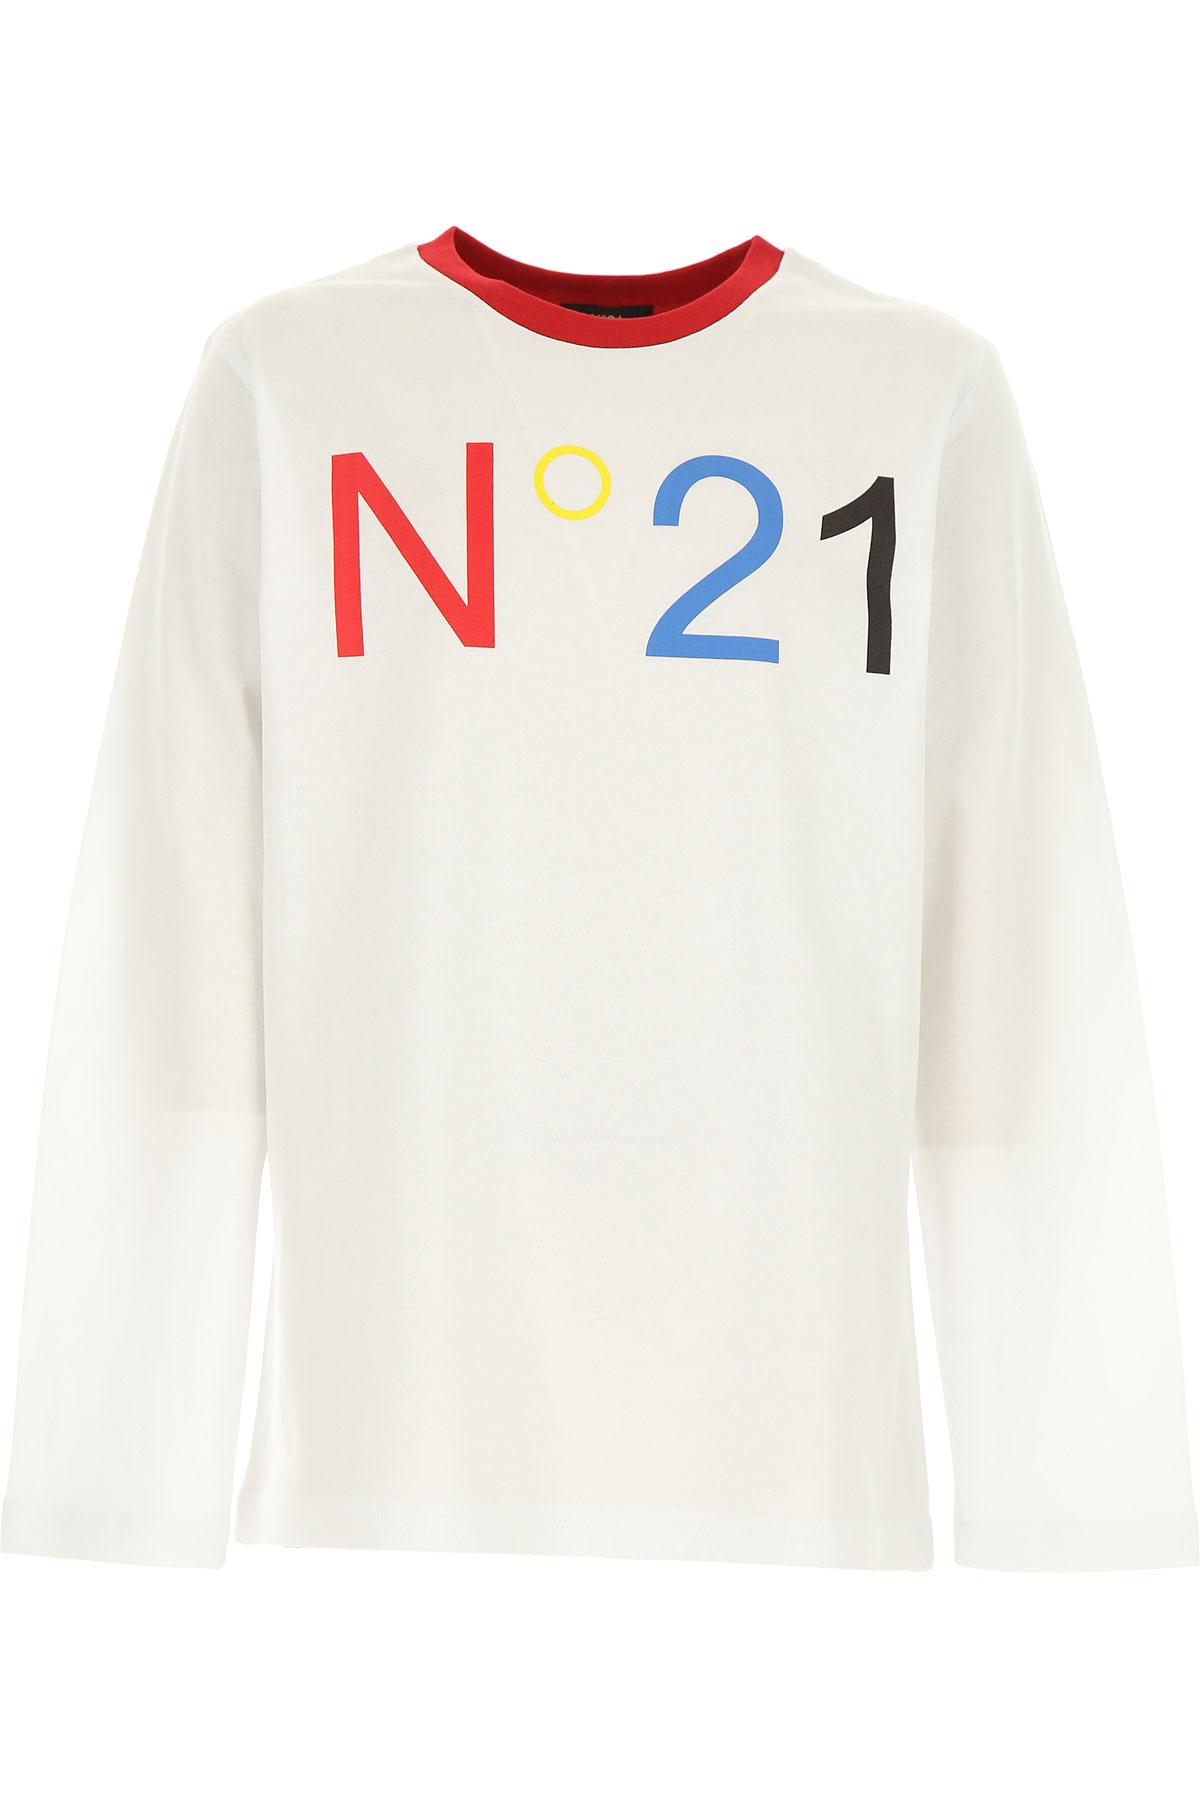 NO 21 Kids T-Shirt for Boys On Sale, White, Cotton, 2019, 10Y 12Y 14Y 8Y